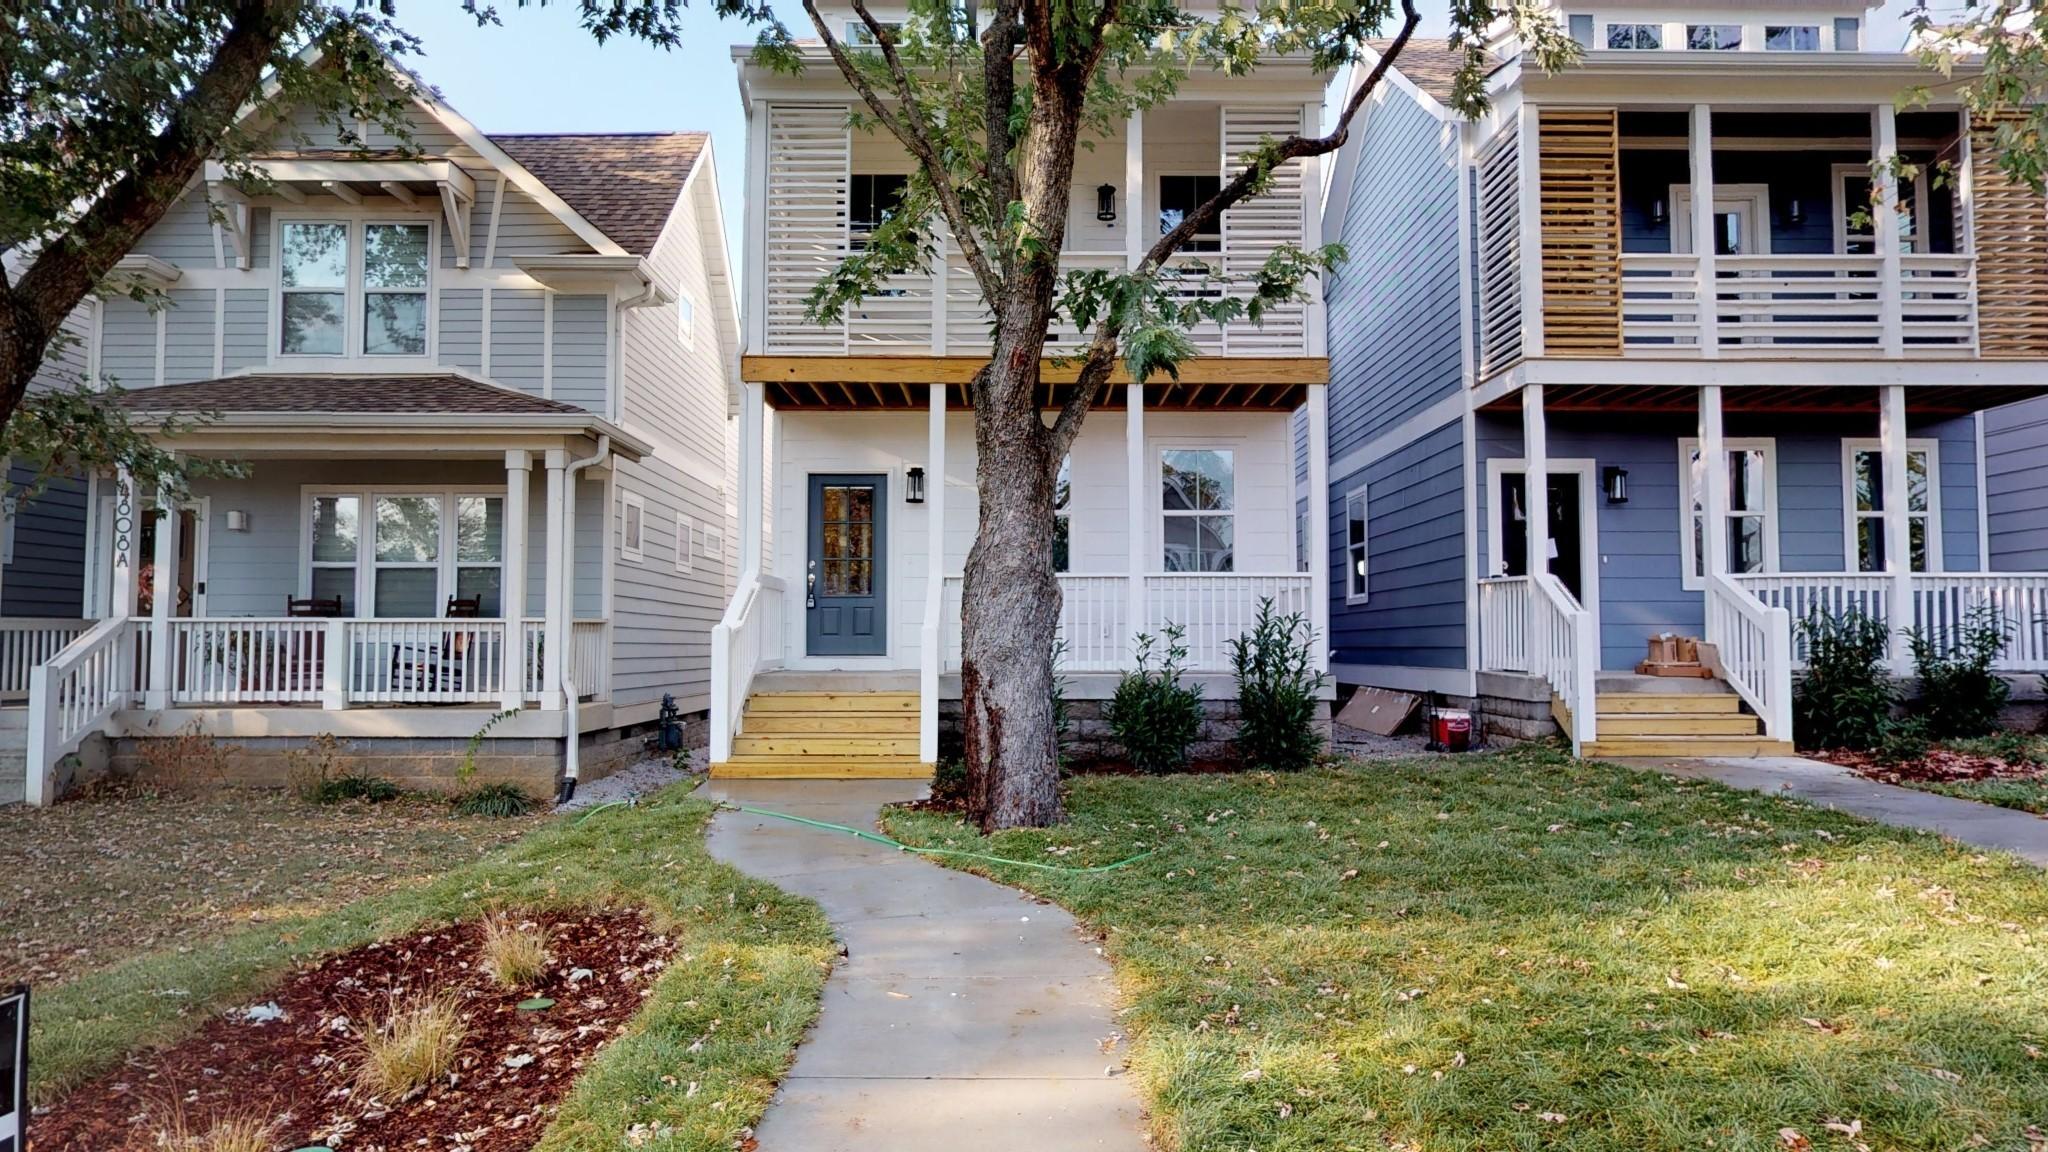 4910 Michigan Ave Property Photo - Nashville, TN real estate listing